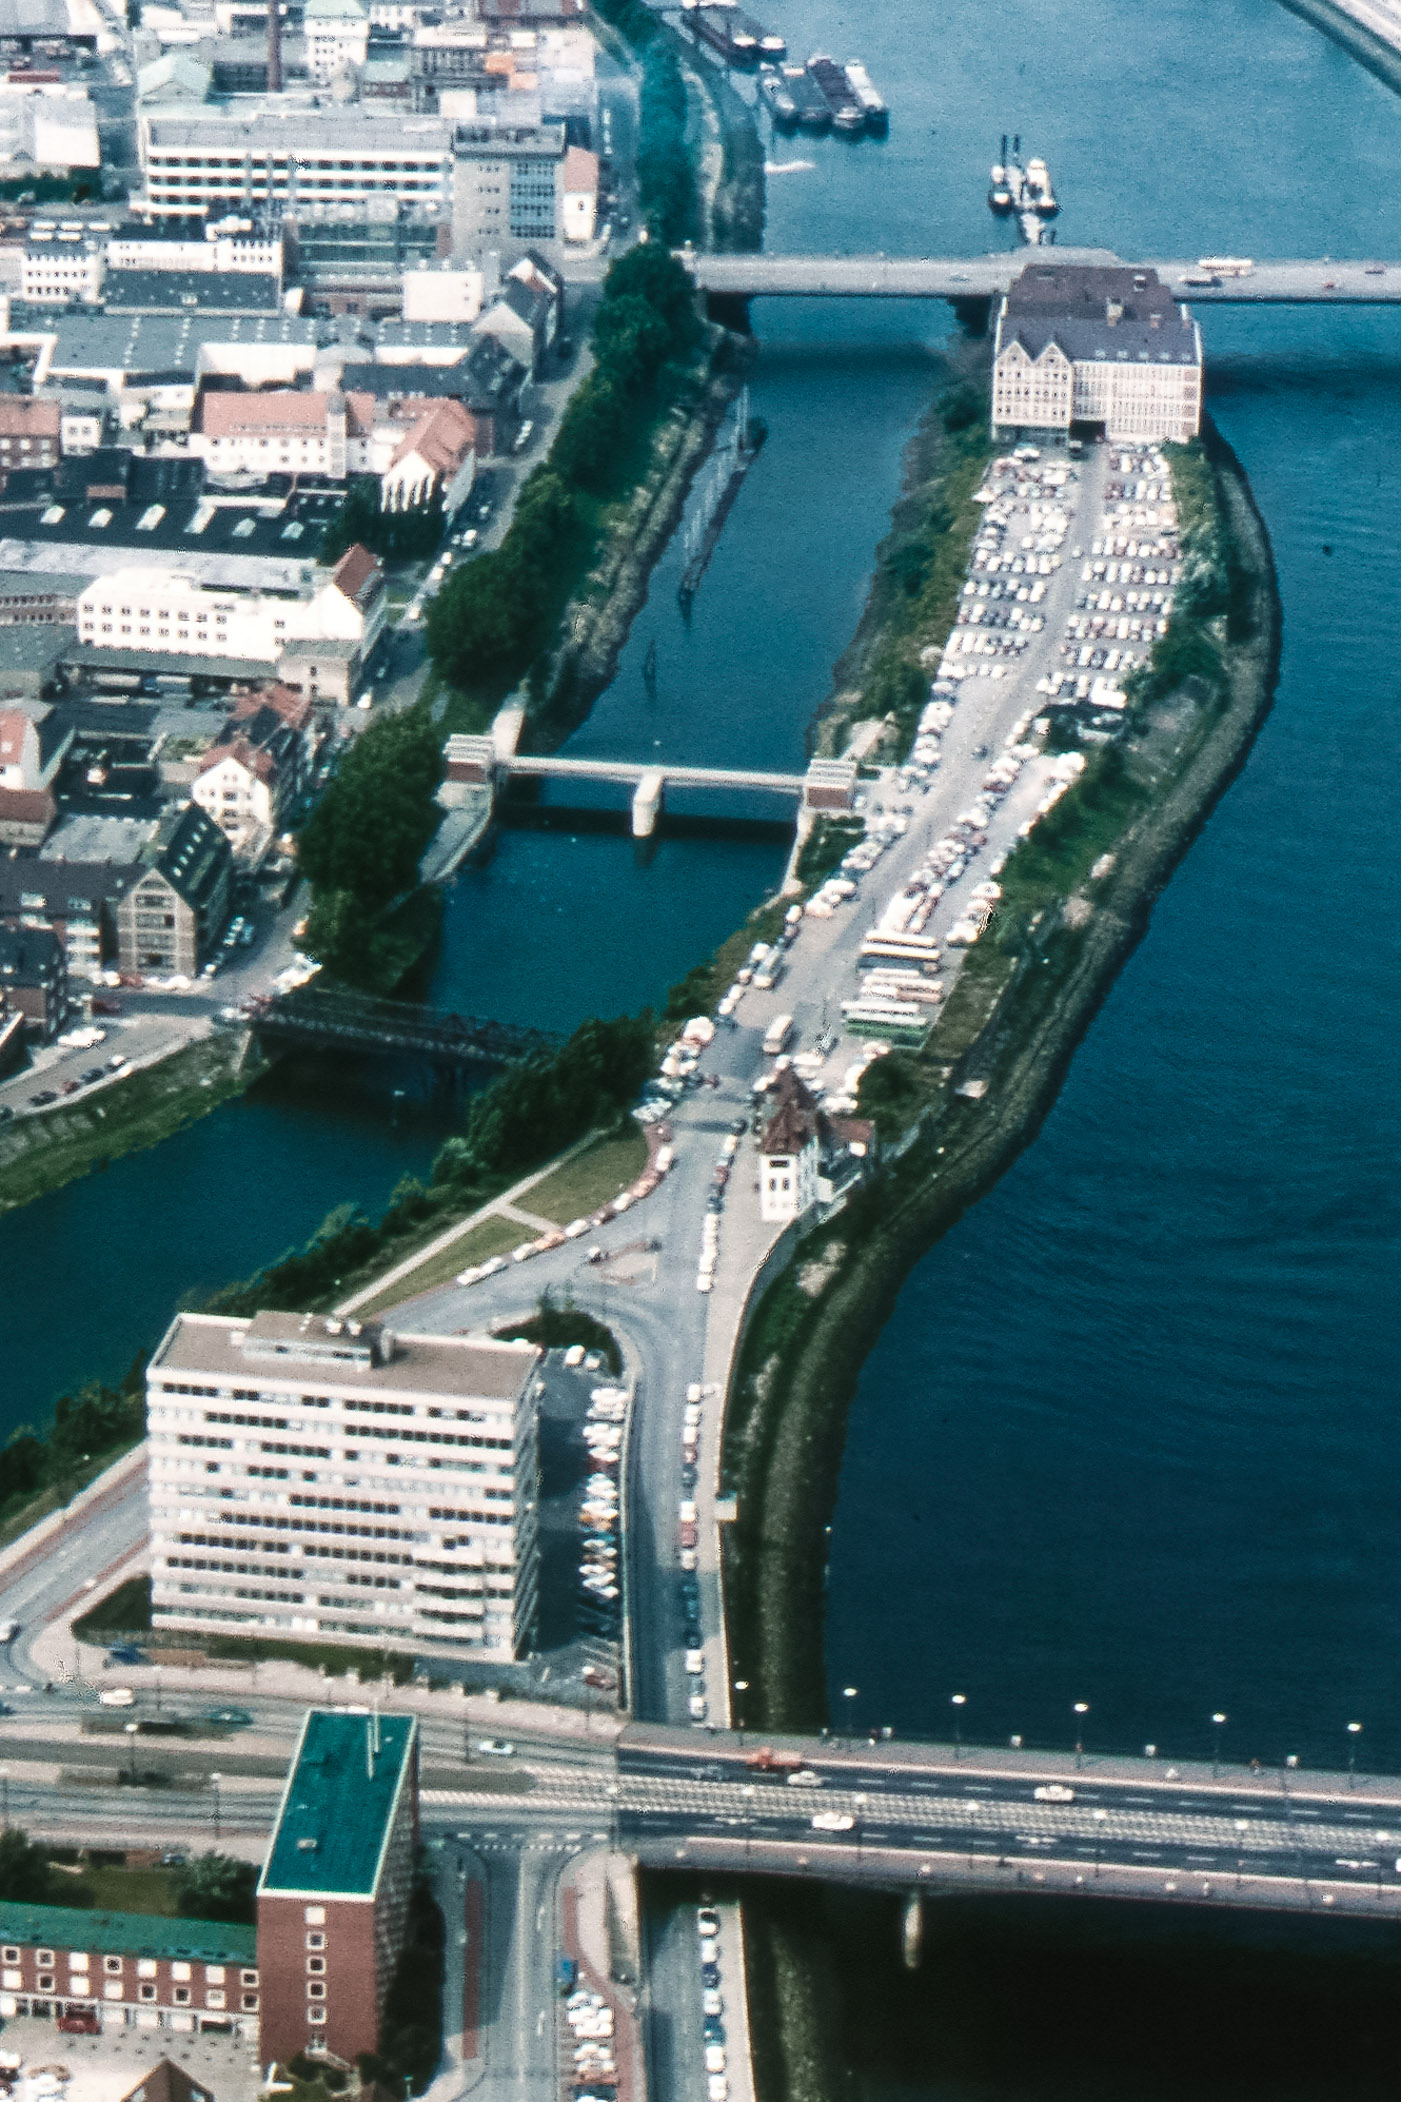 Hubschrauberflug 1971 / Fotoarchiv LIS, G. Rittstieg